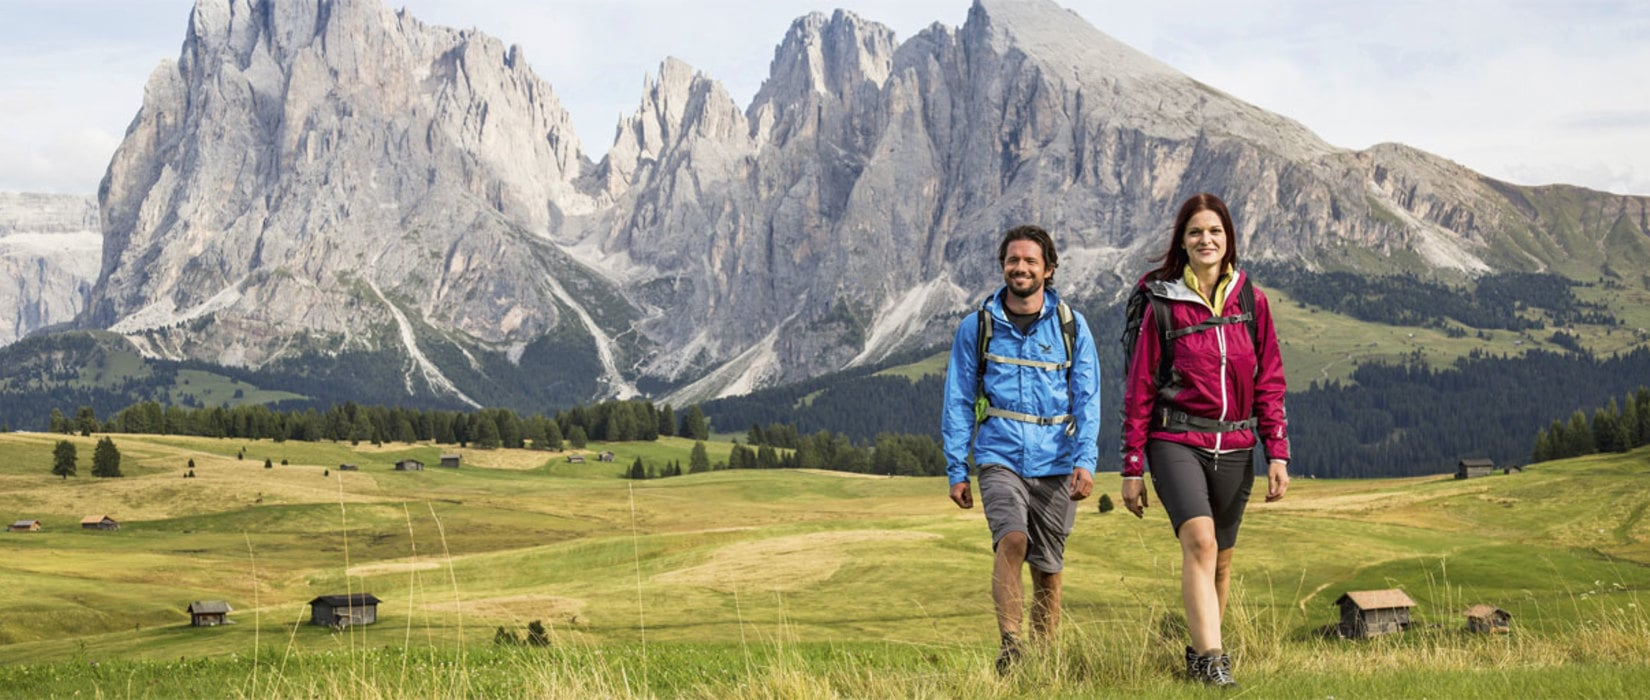 In Alto Adige si sta al fresco!